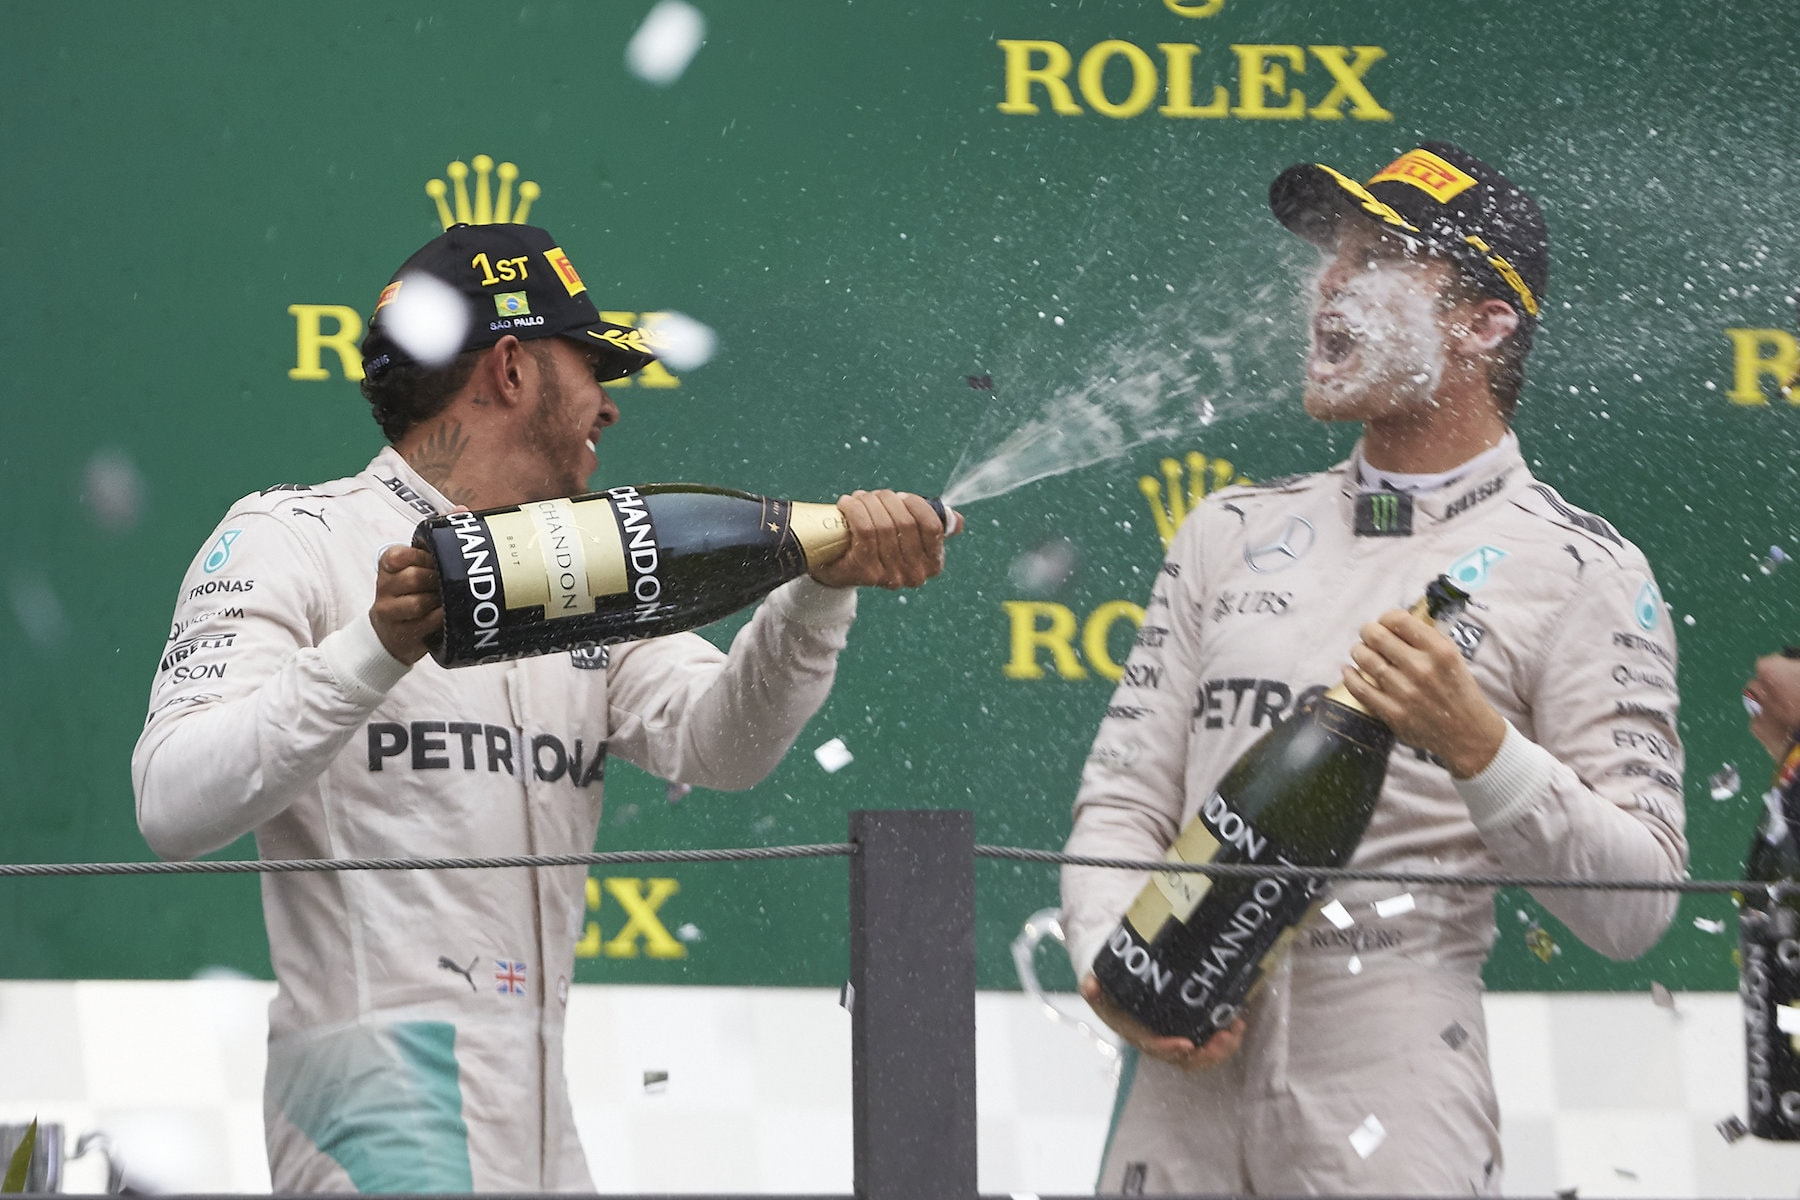 Salracing - Lewis spraying some champagne on Nico